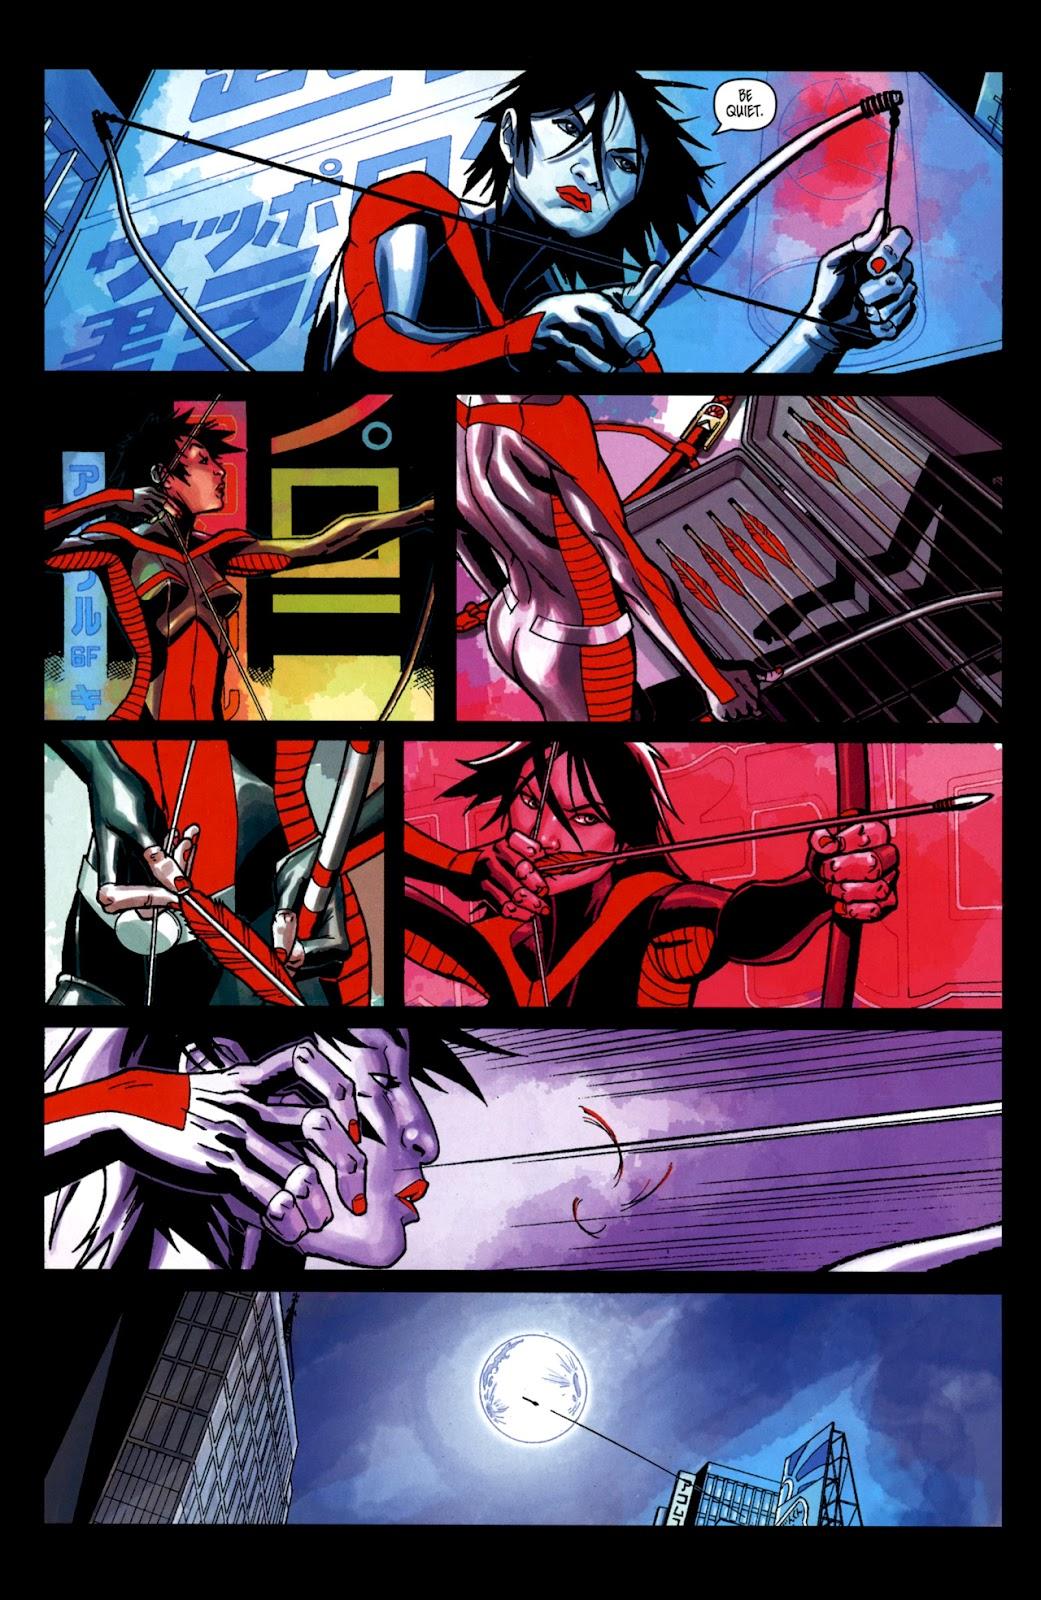 Read online Shinku comic -  Issue #2 - 7